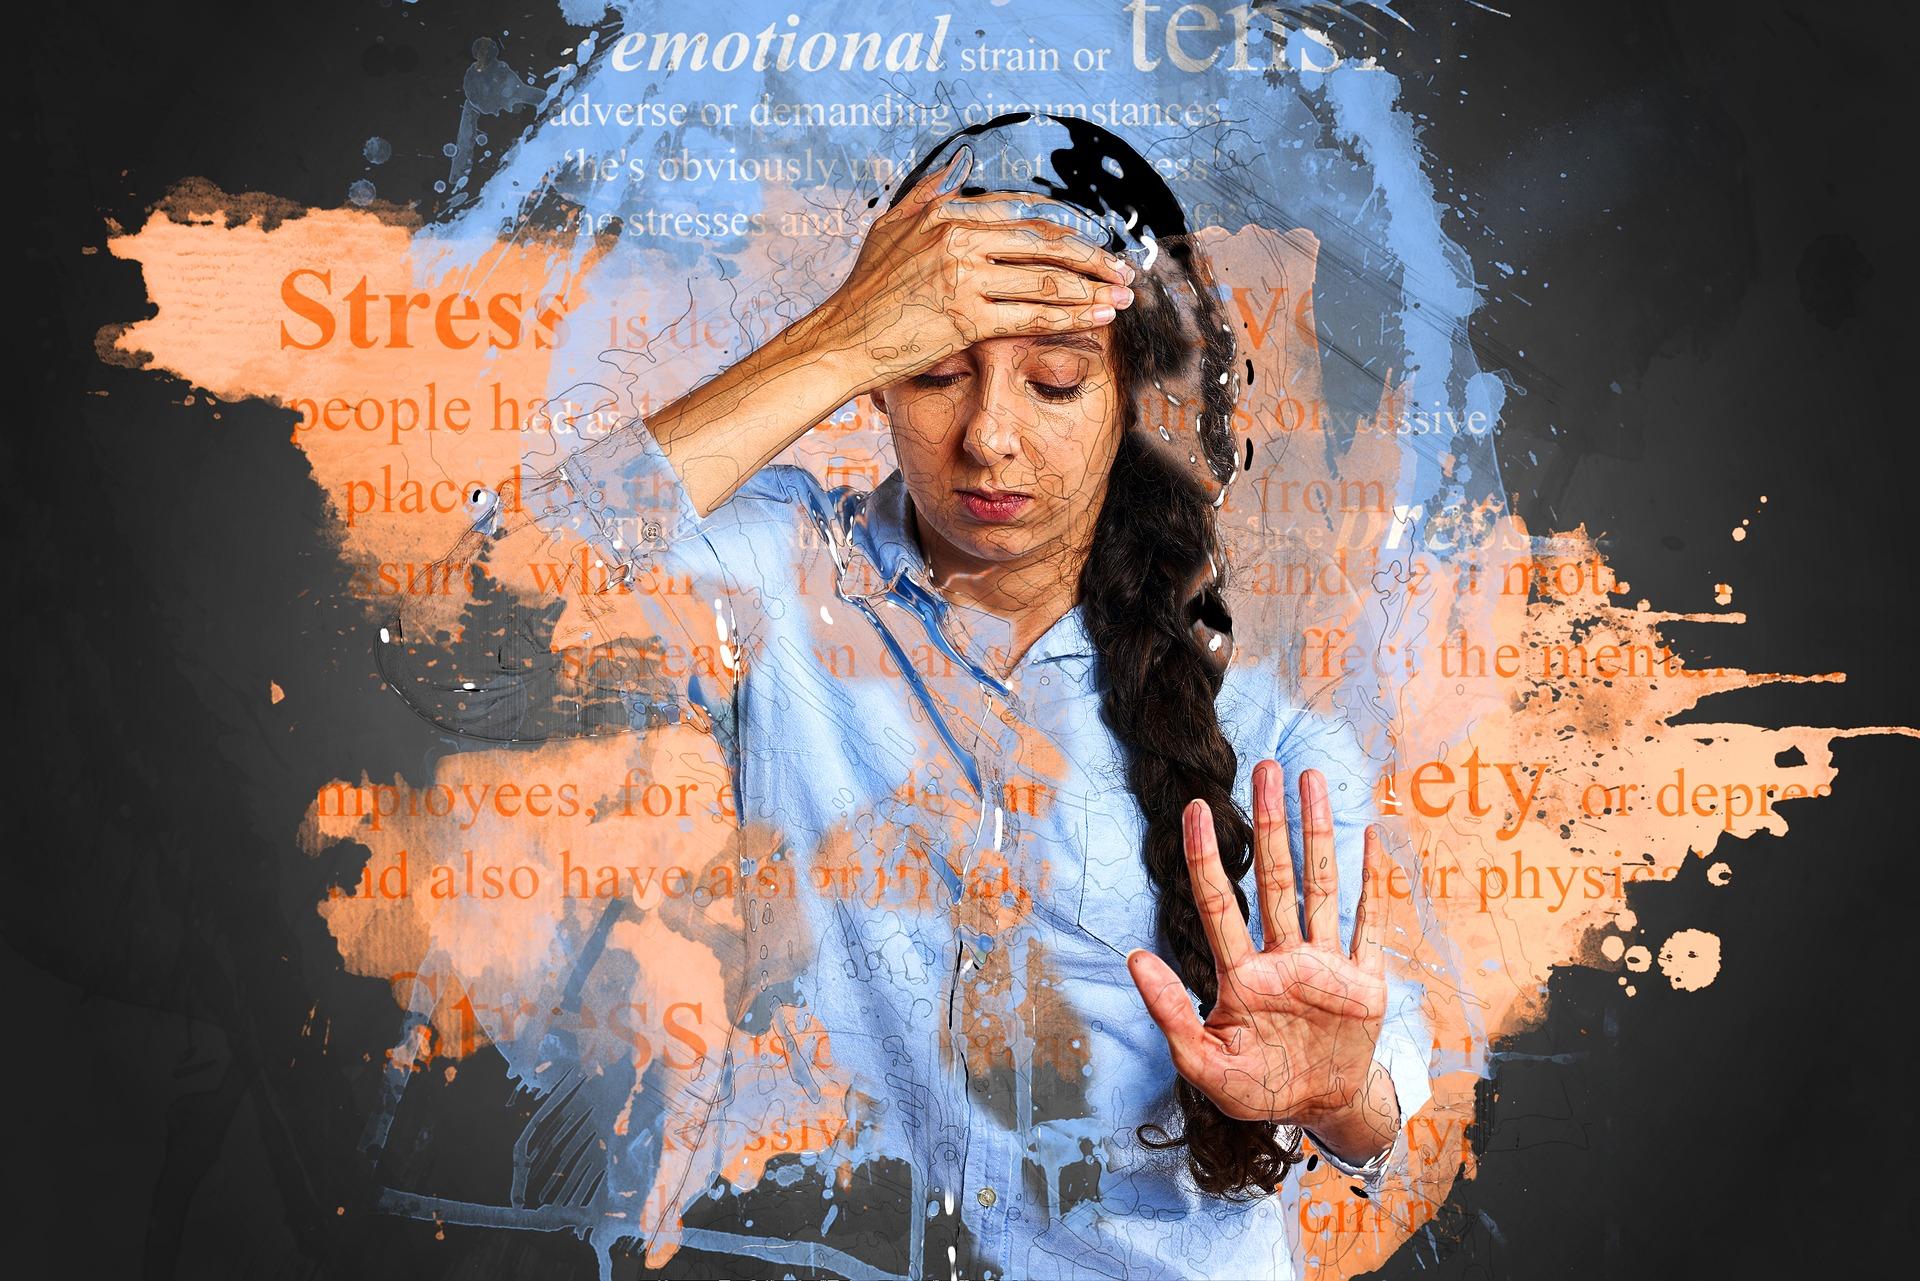 gestione di stress e ansia